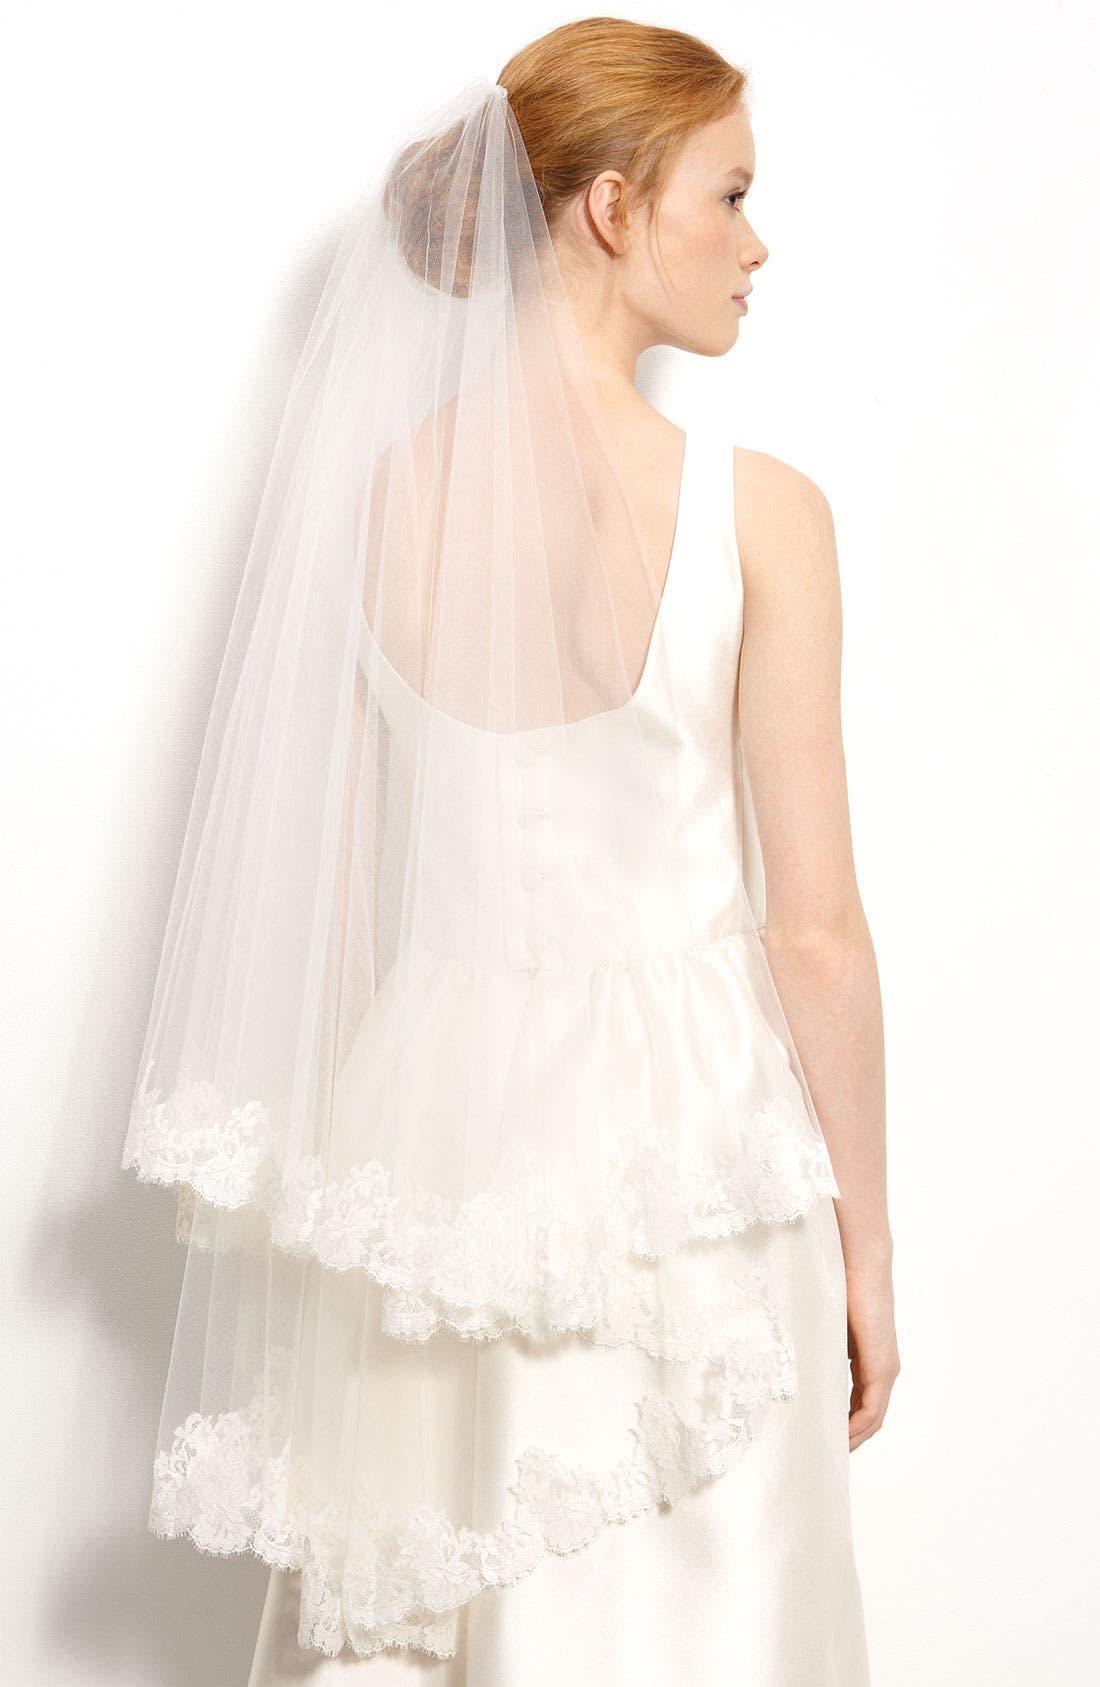 Alternate Image 1 Selected - Nina 'Duchess' Veil